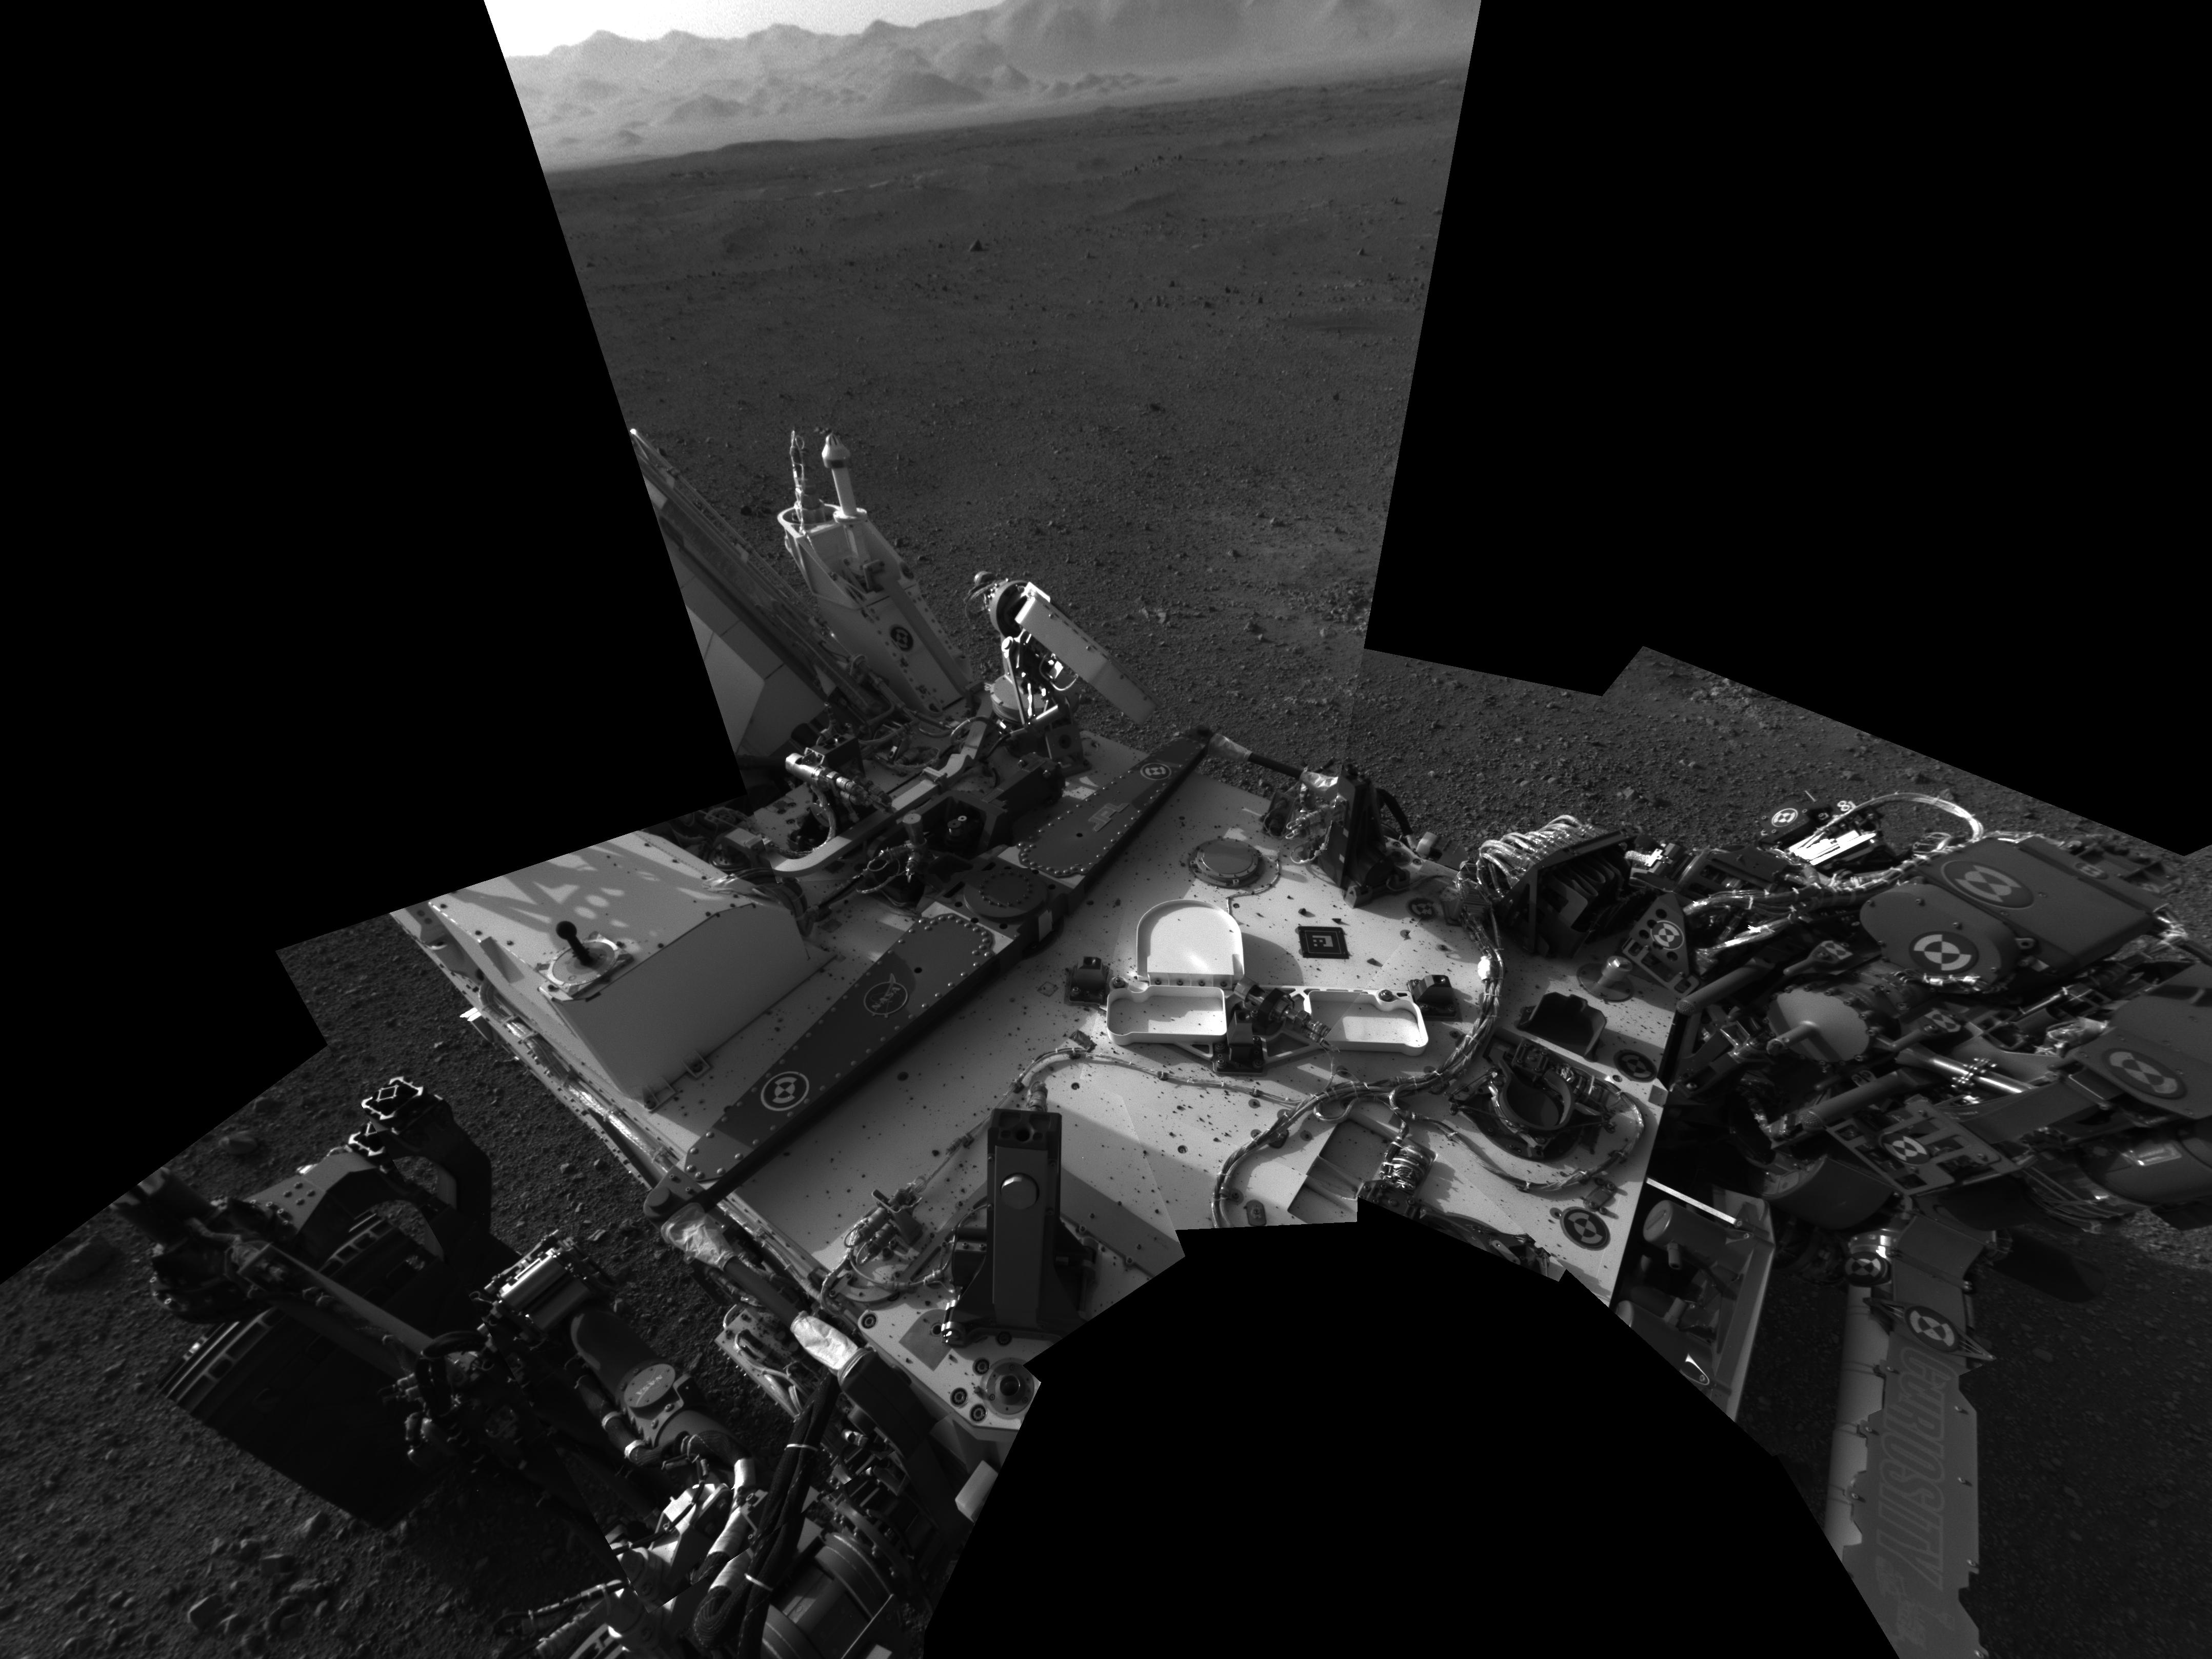 curiostiy mission space - photo #21